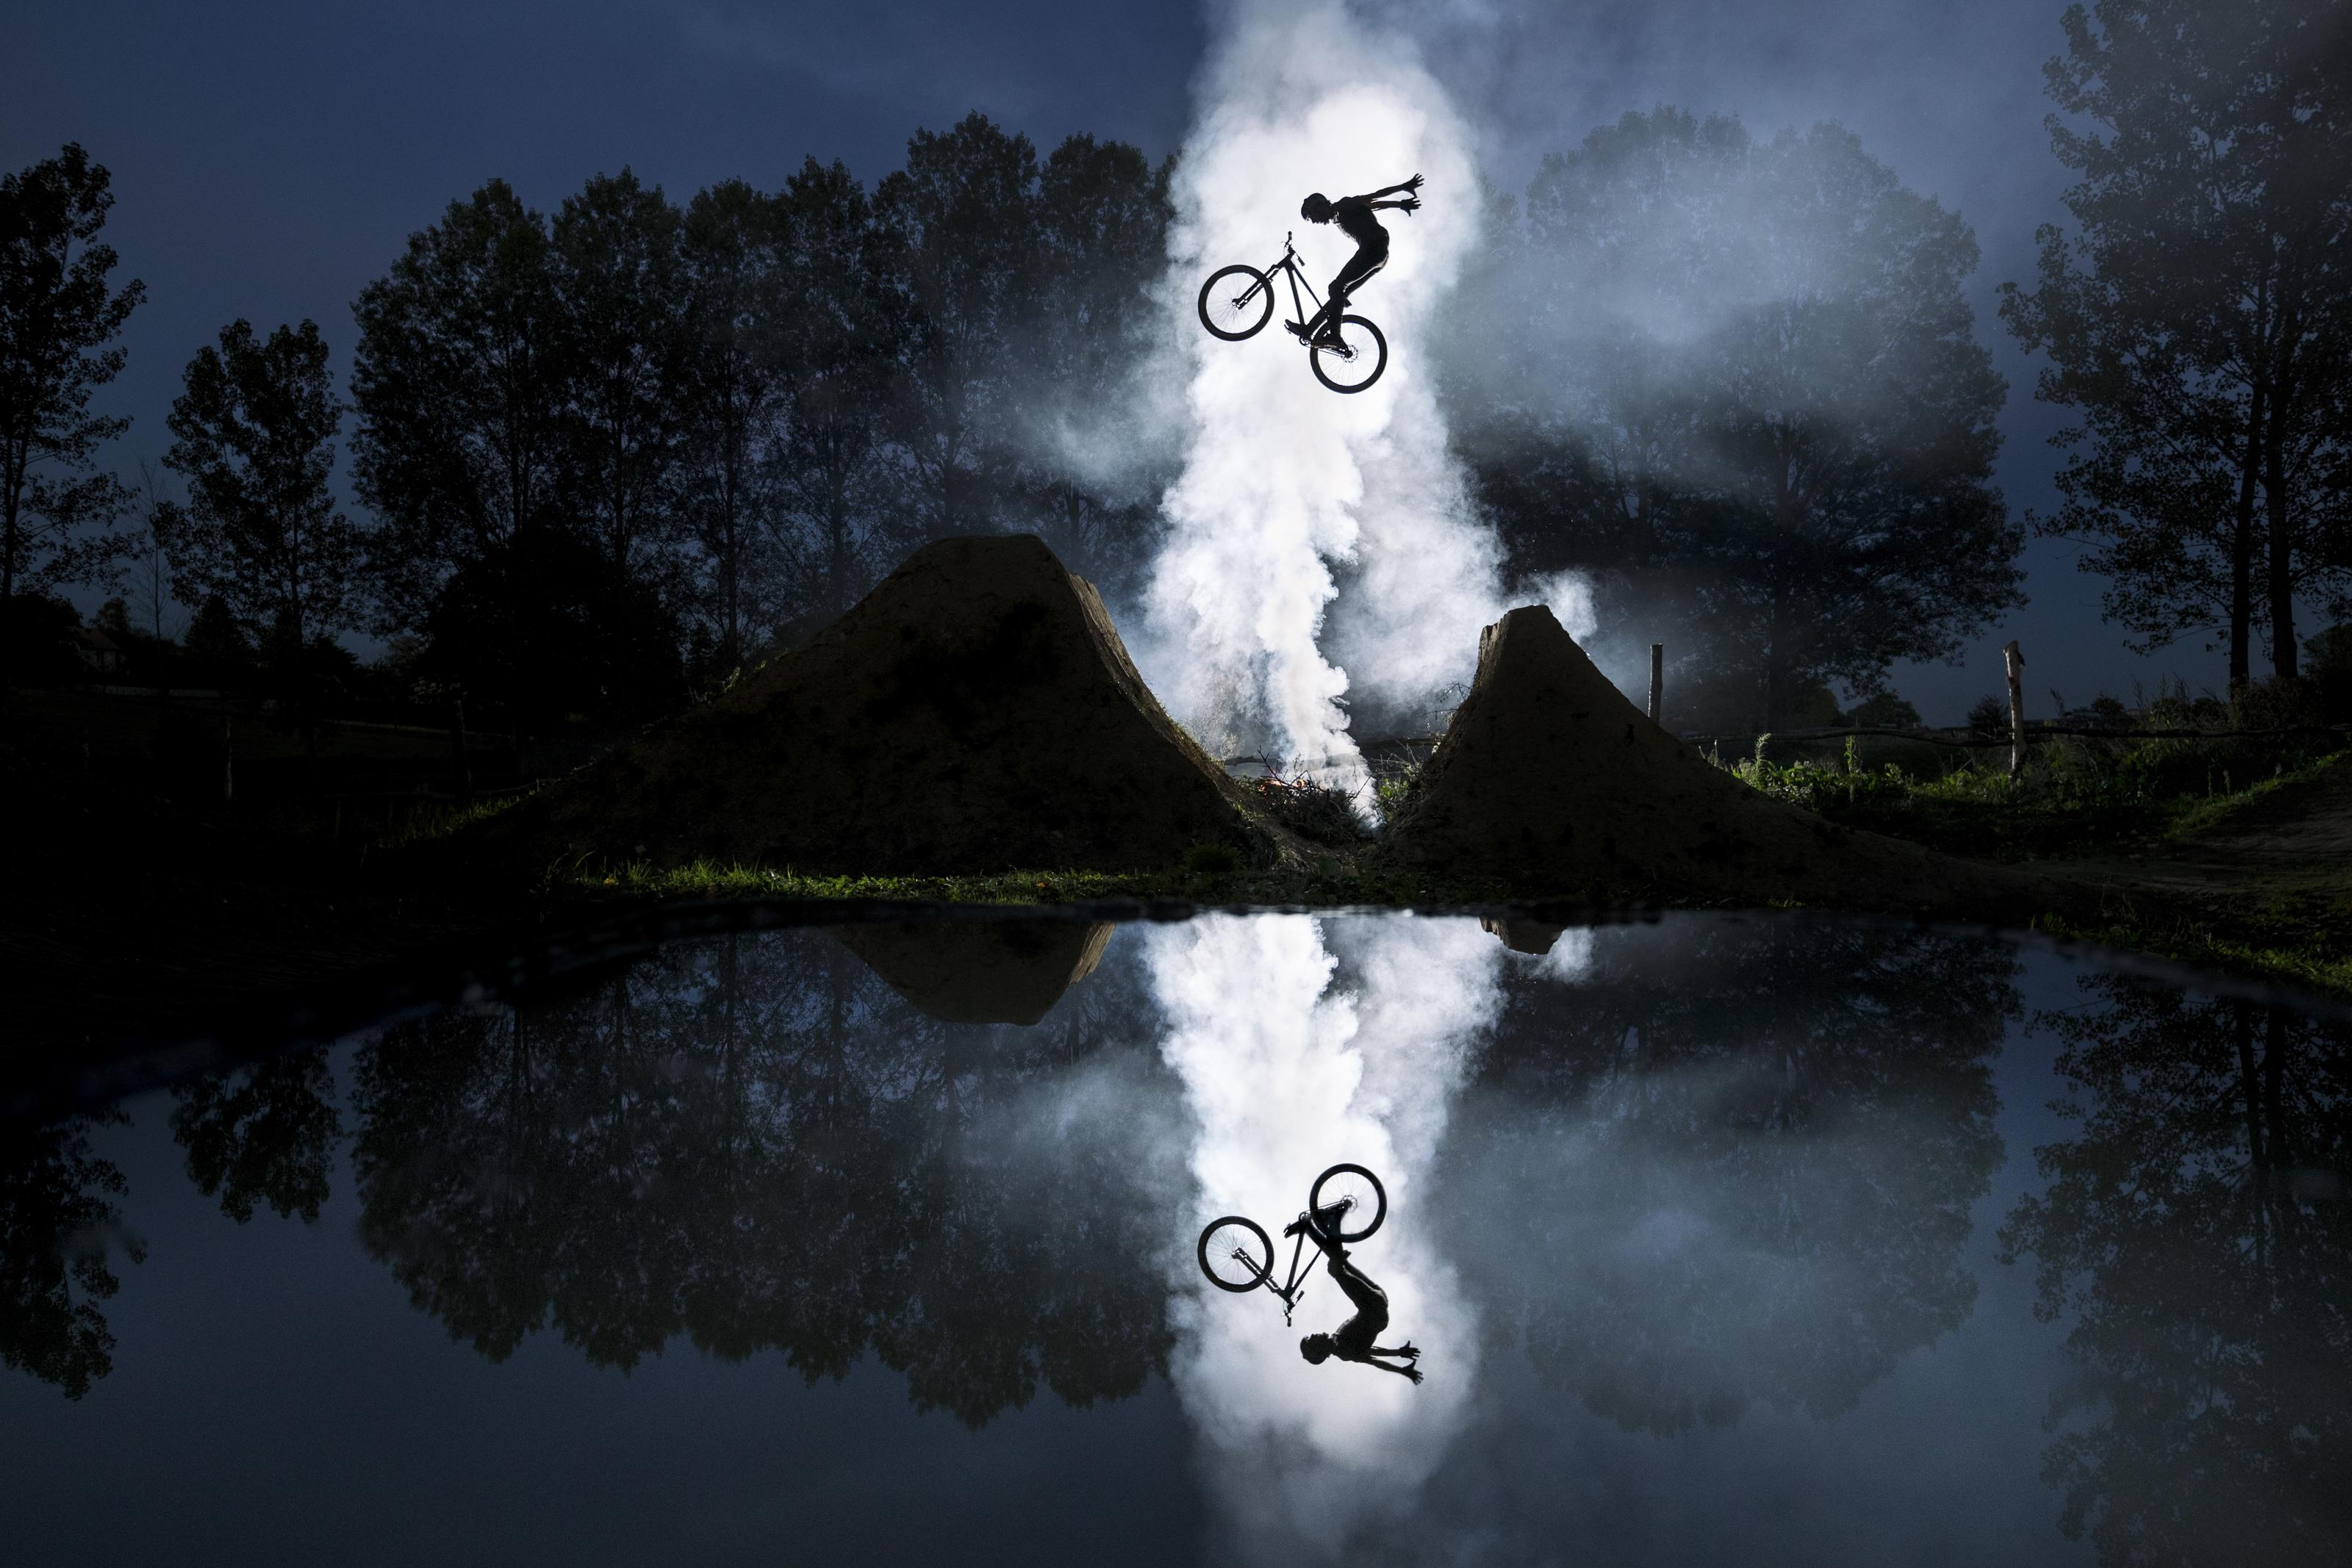 Mountain Bike Photographers Take Several Awards at Red Bull Illume - Here are the Shots - Singletracks Mountain Bike News